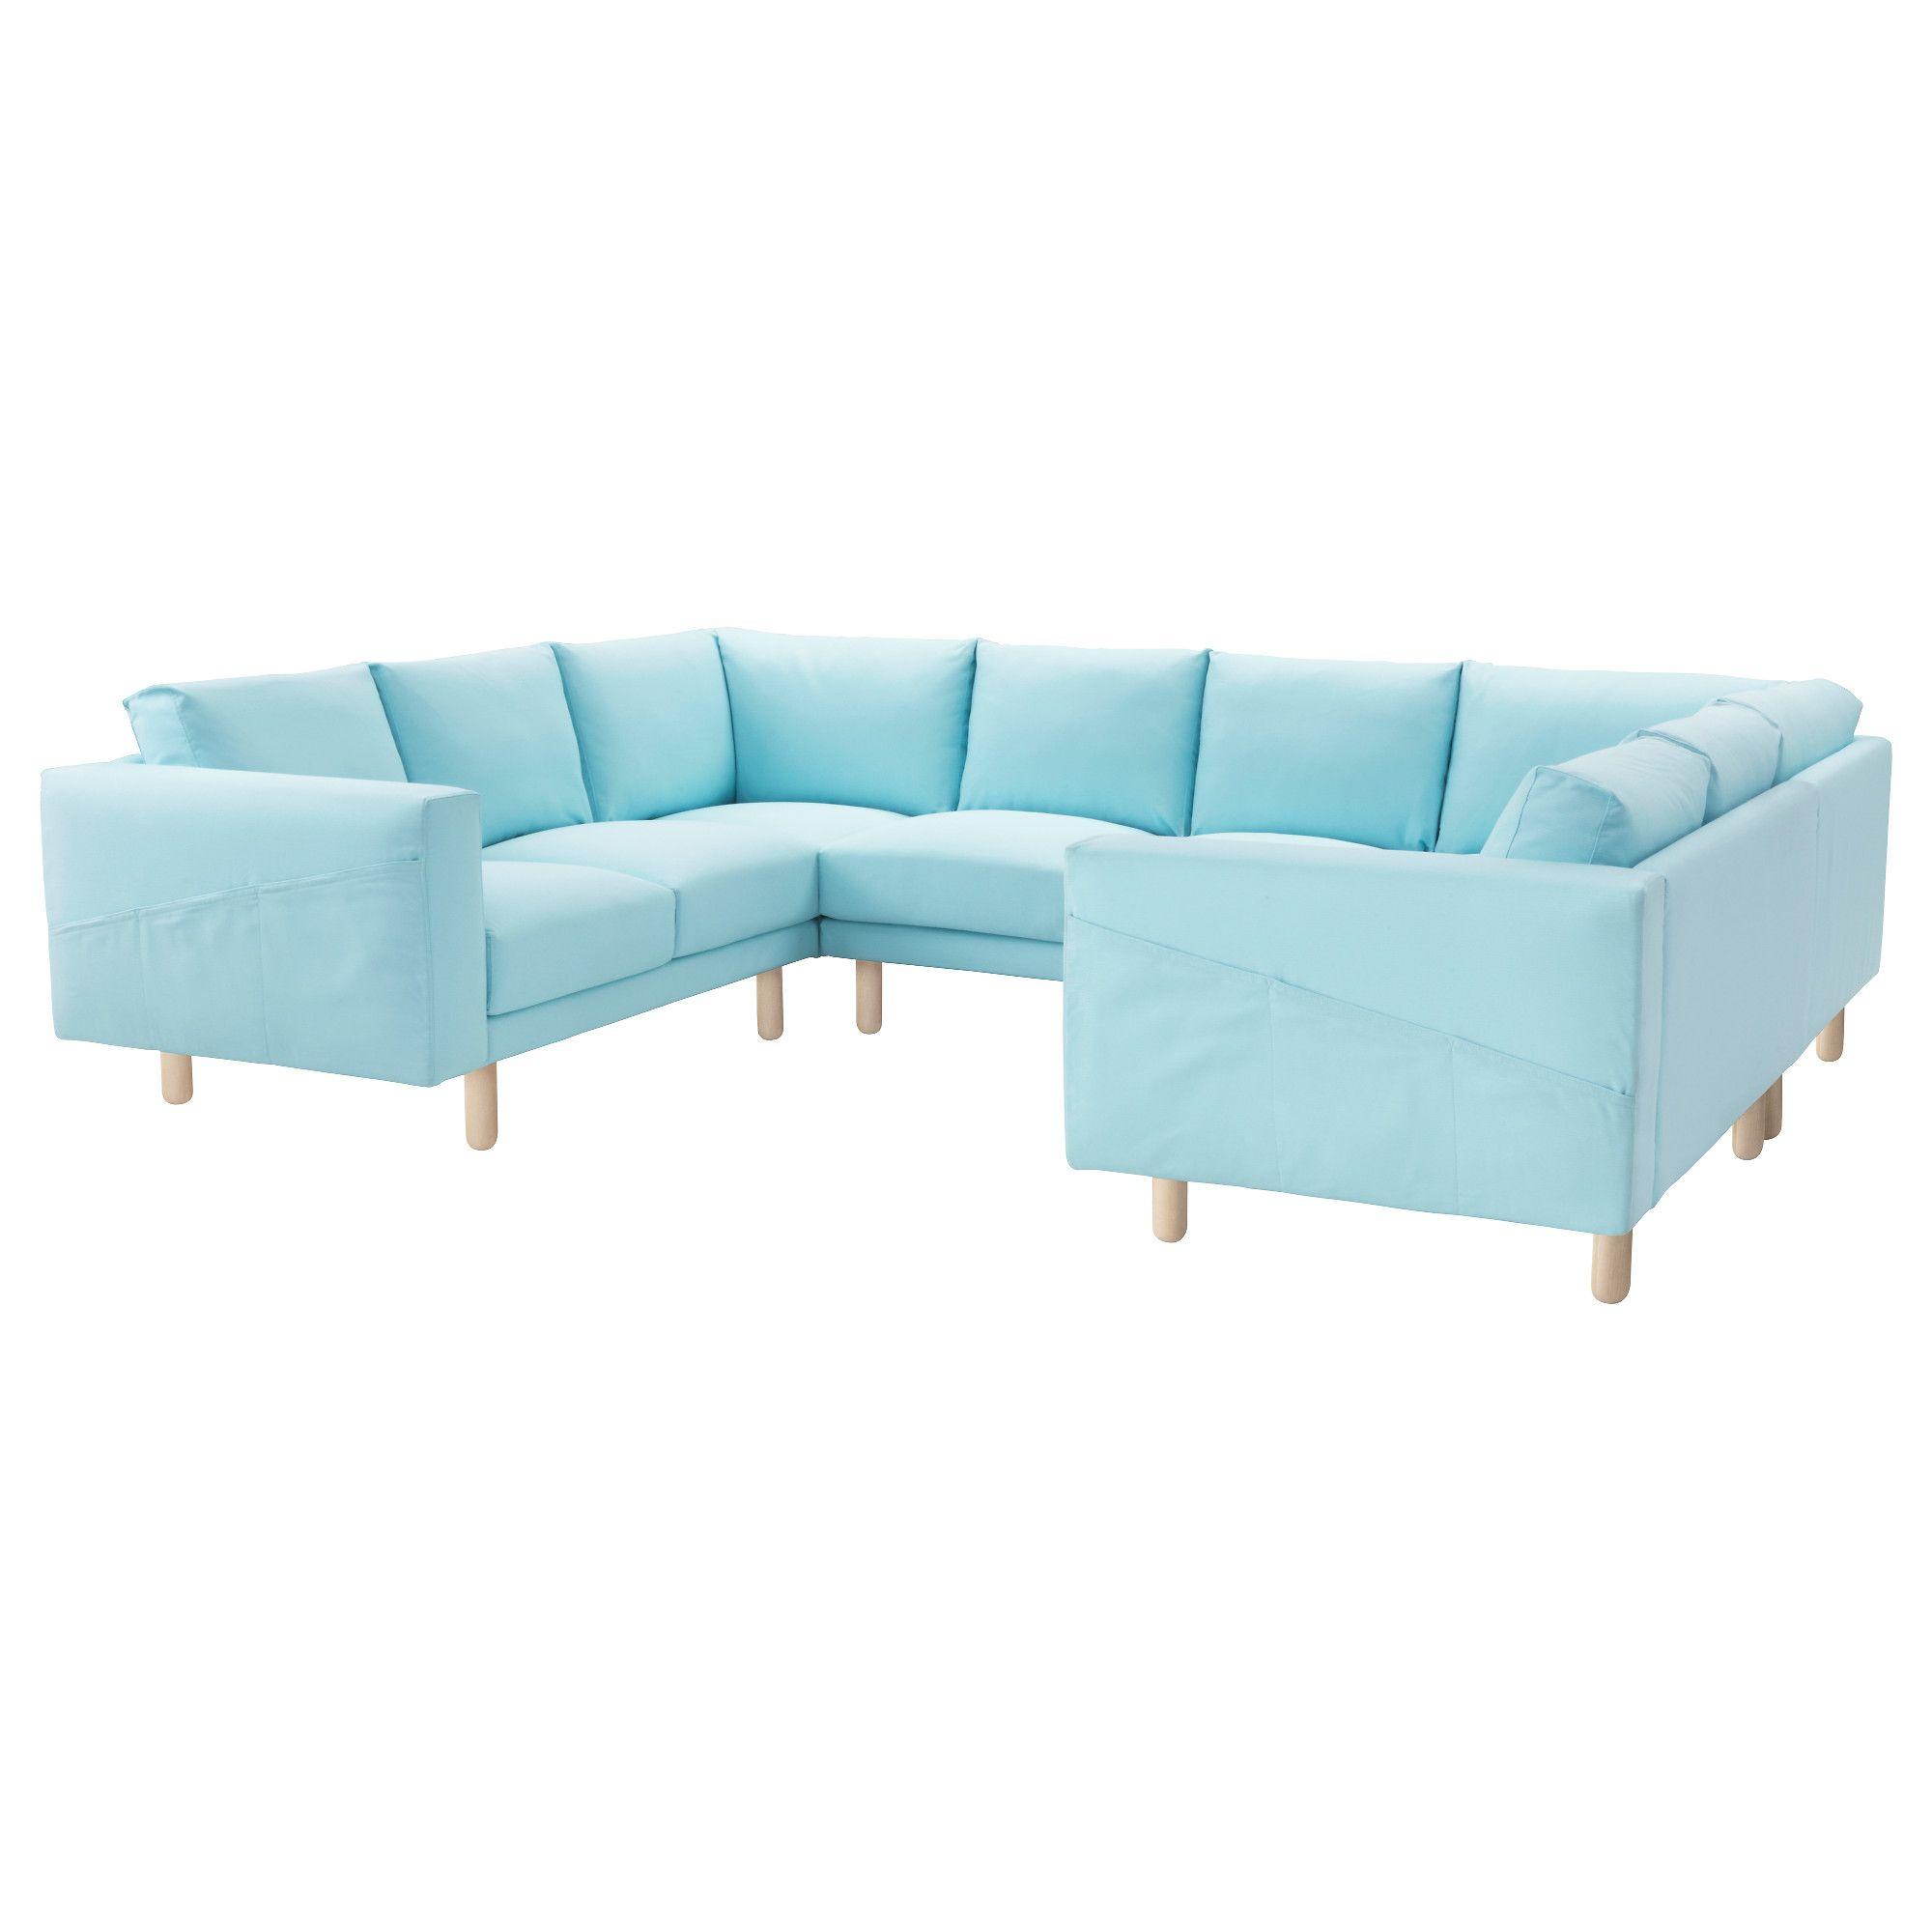 NORSBORG, 8er Sofa, U Form, Edum Hellblau, Hellblau Jetzt Bestellen